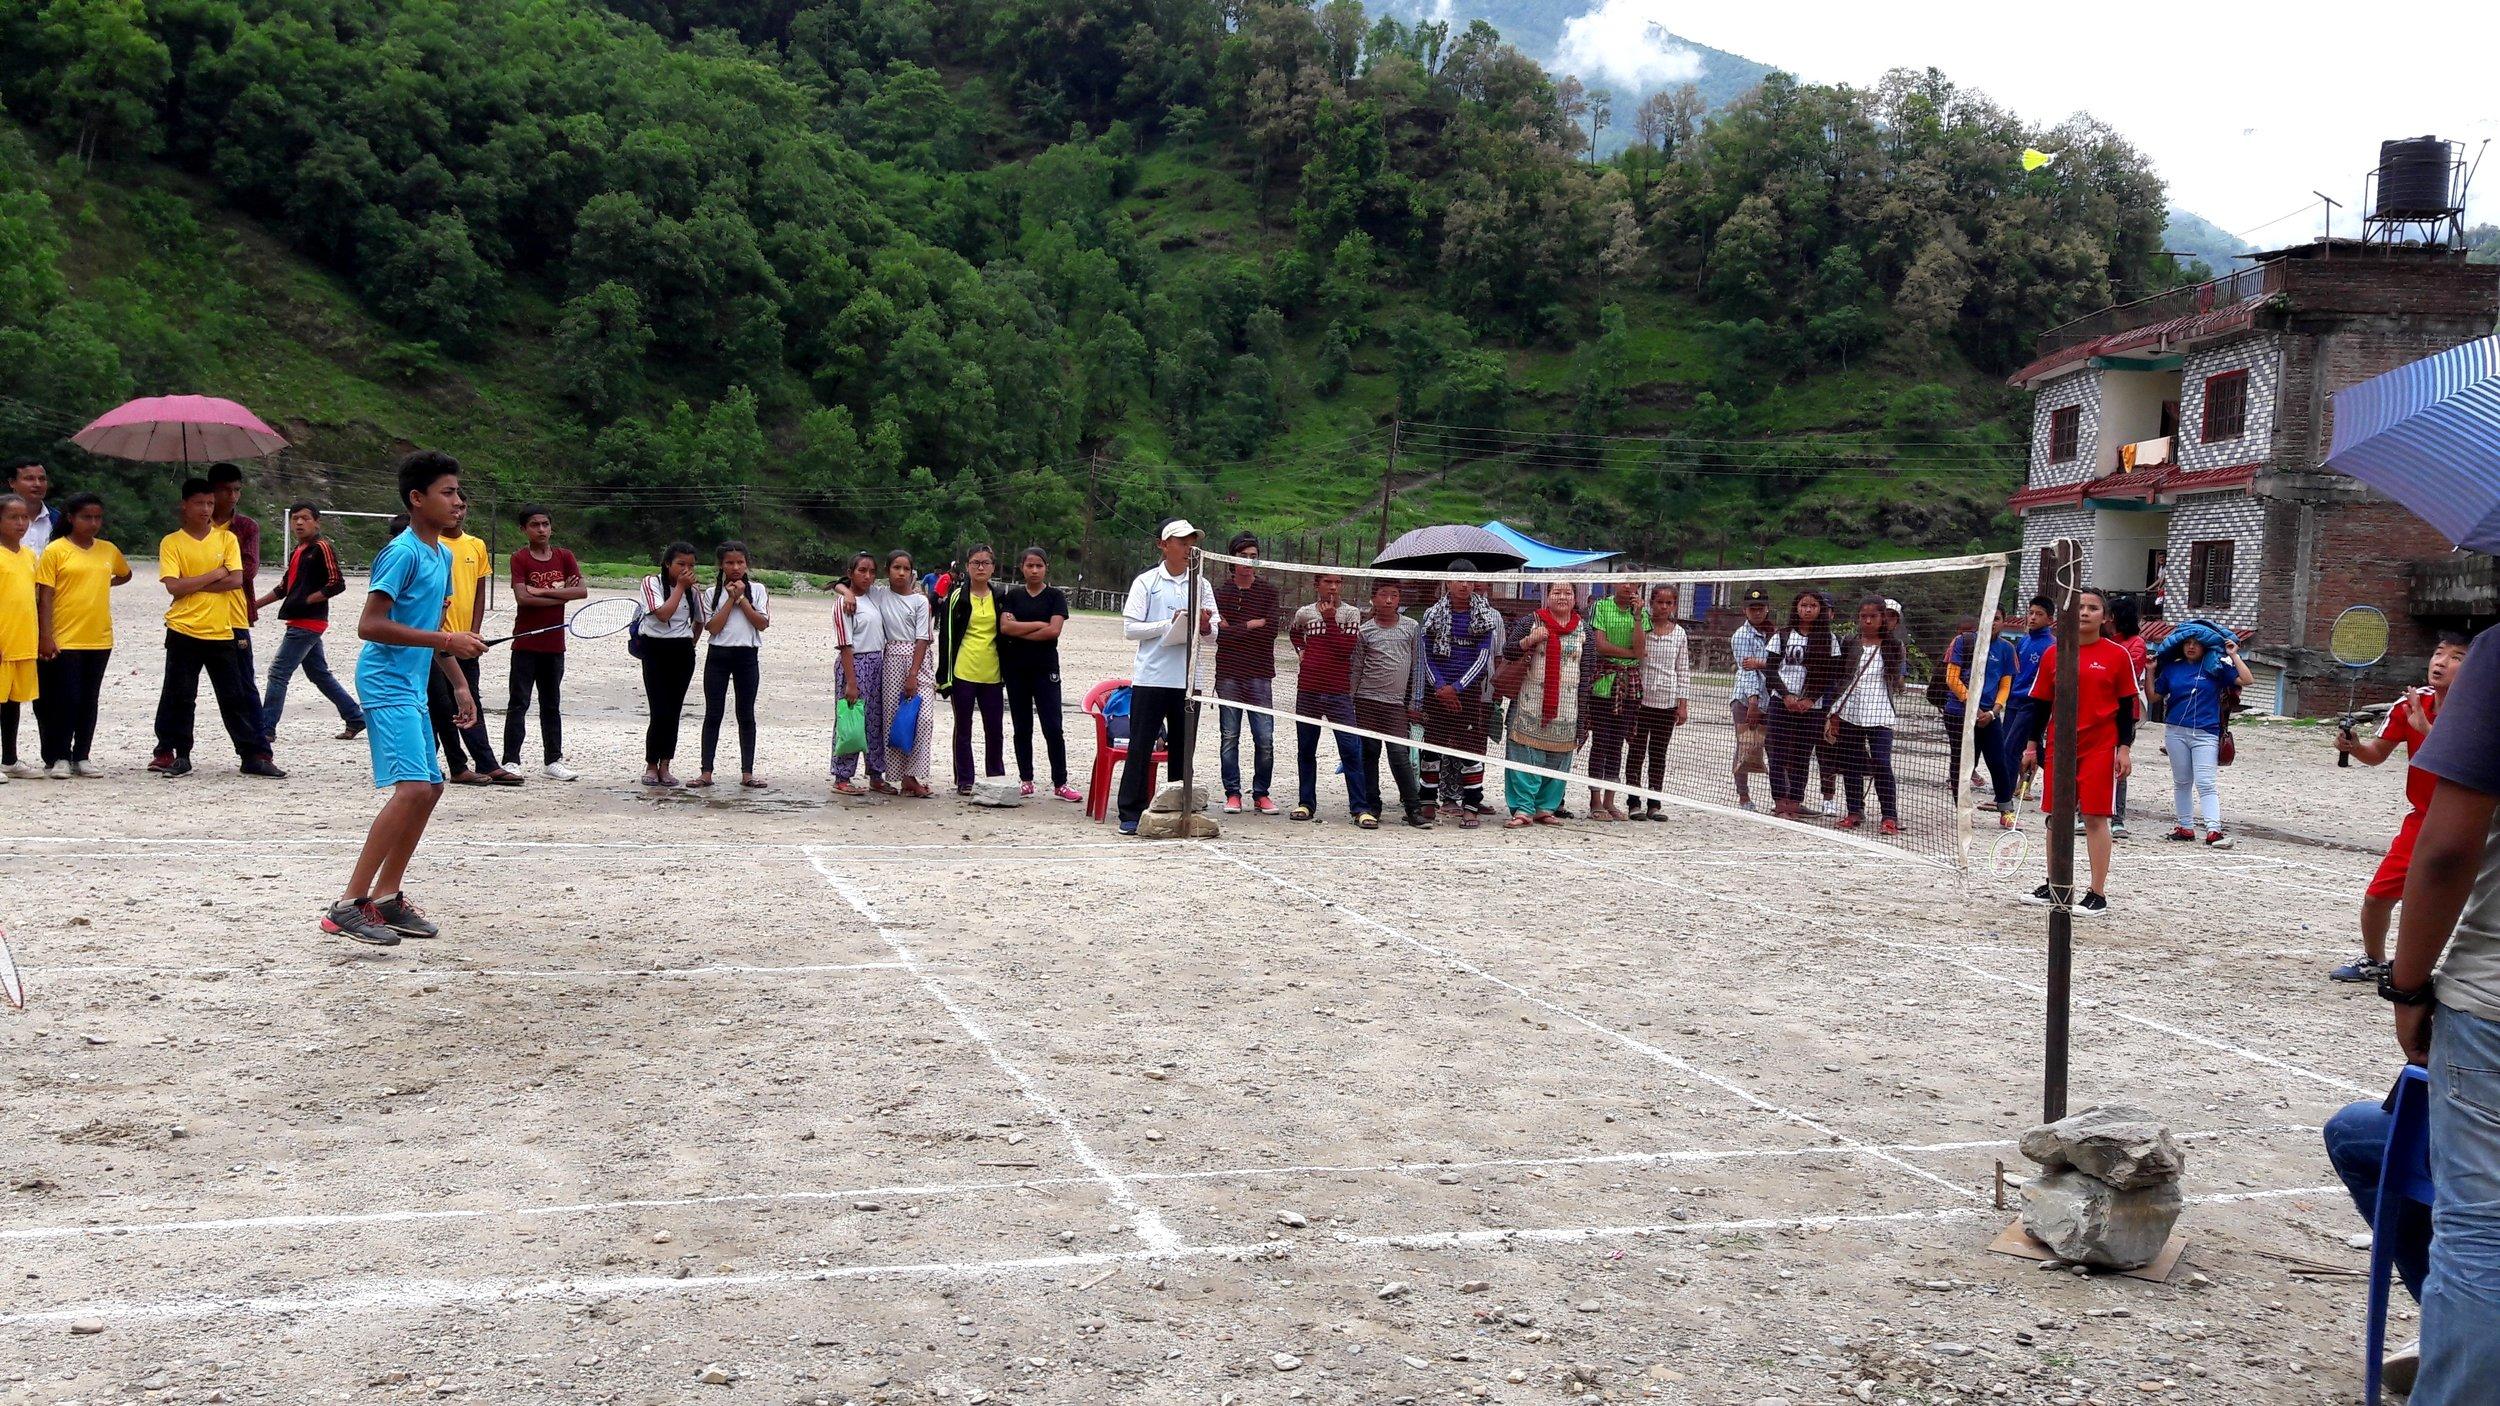 Copy of Khelaun Khelaun 2017 Tournament